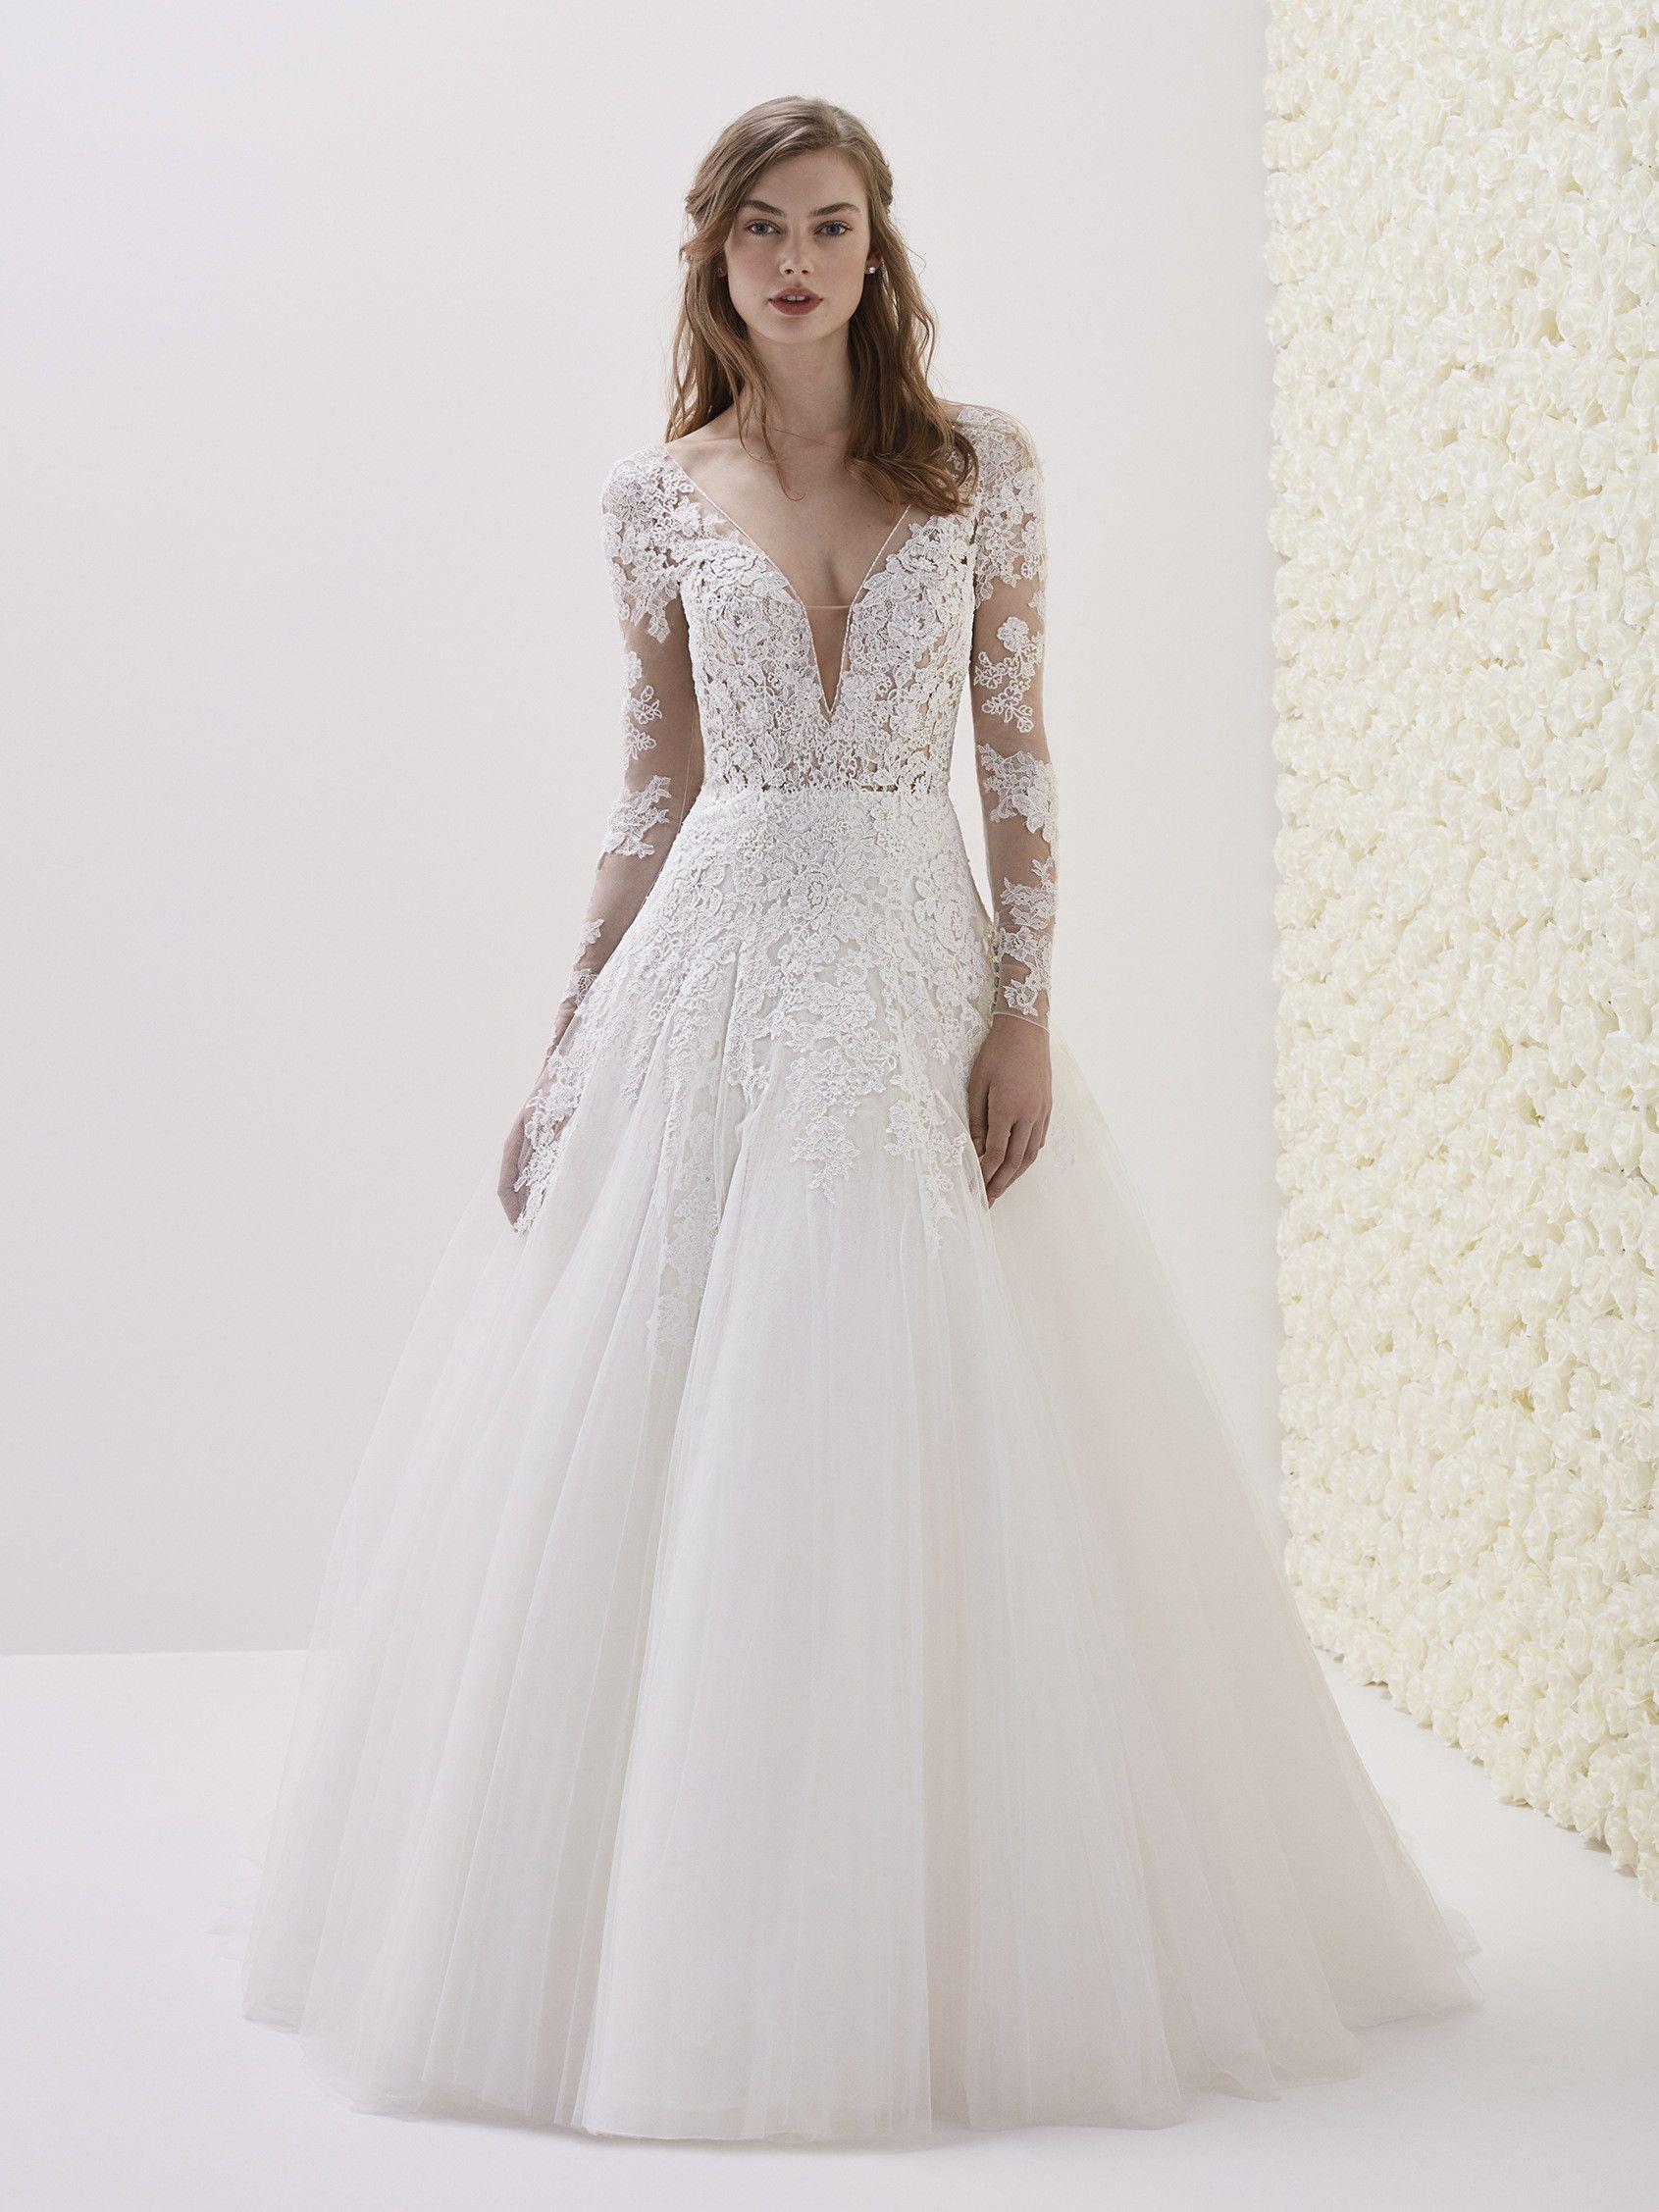 Deep Vneck Long Sleeve Lace Aline Wedding Dress on